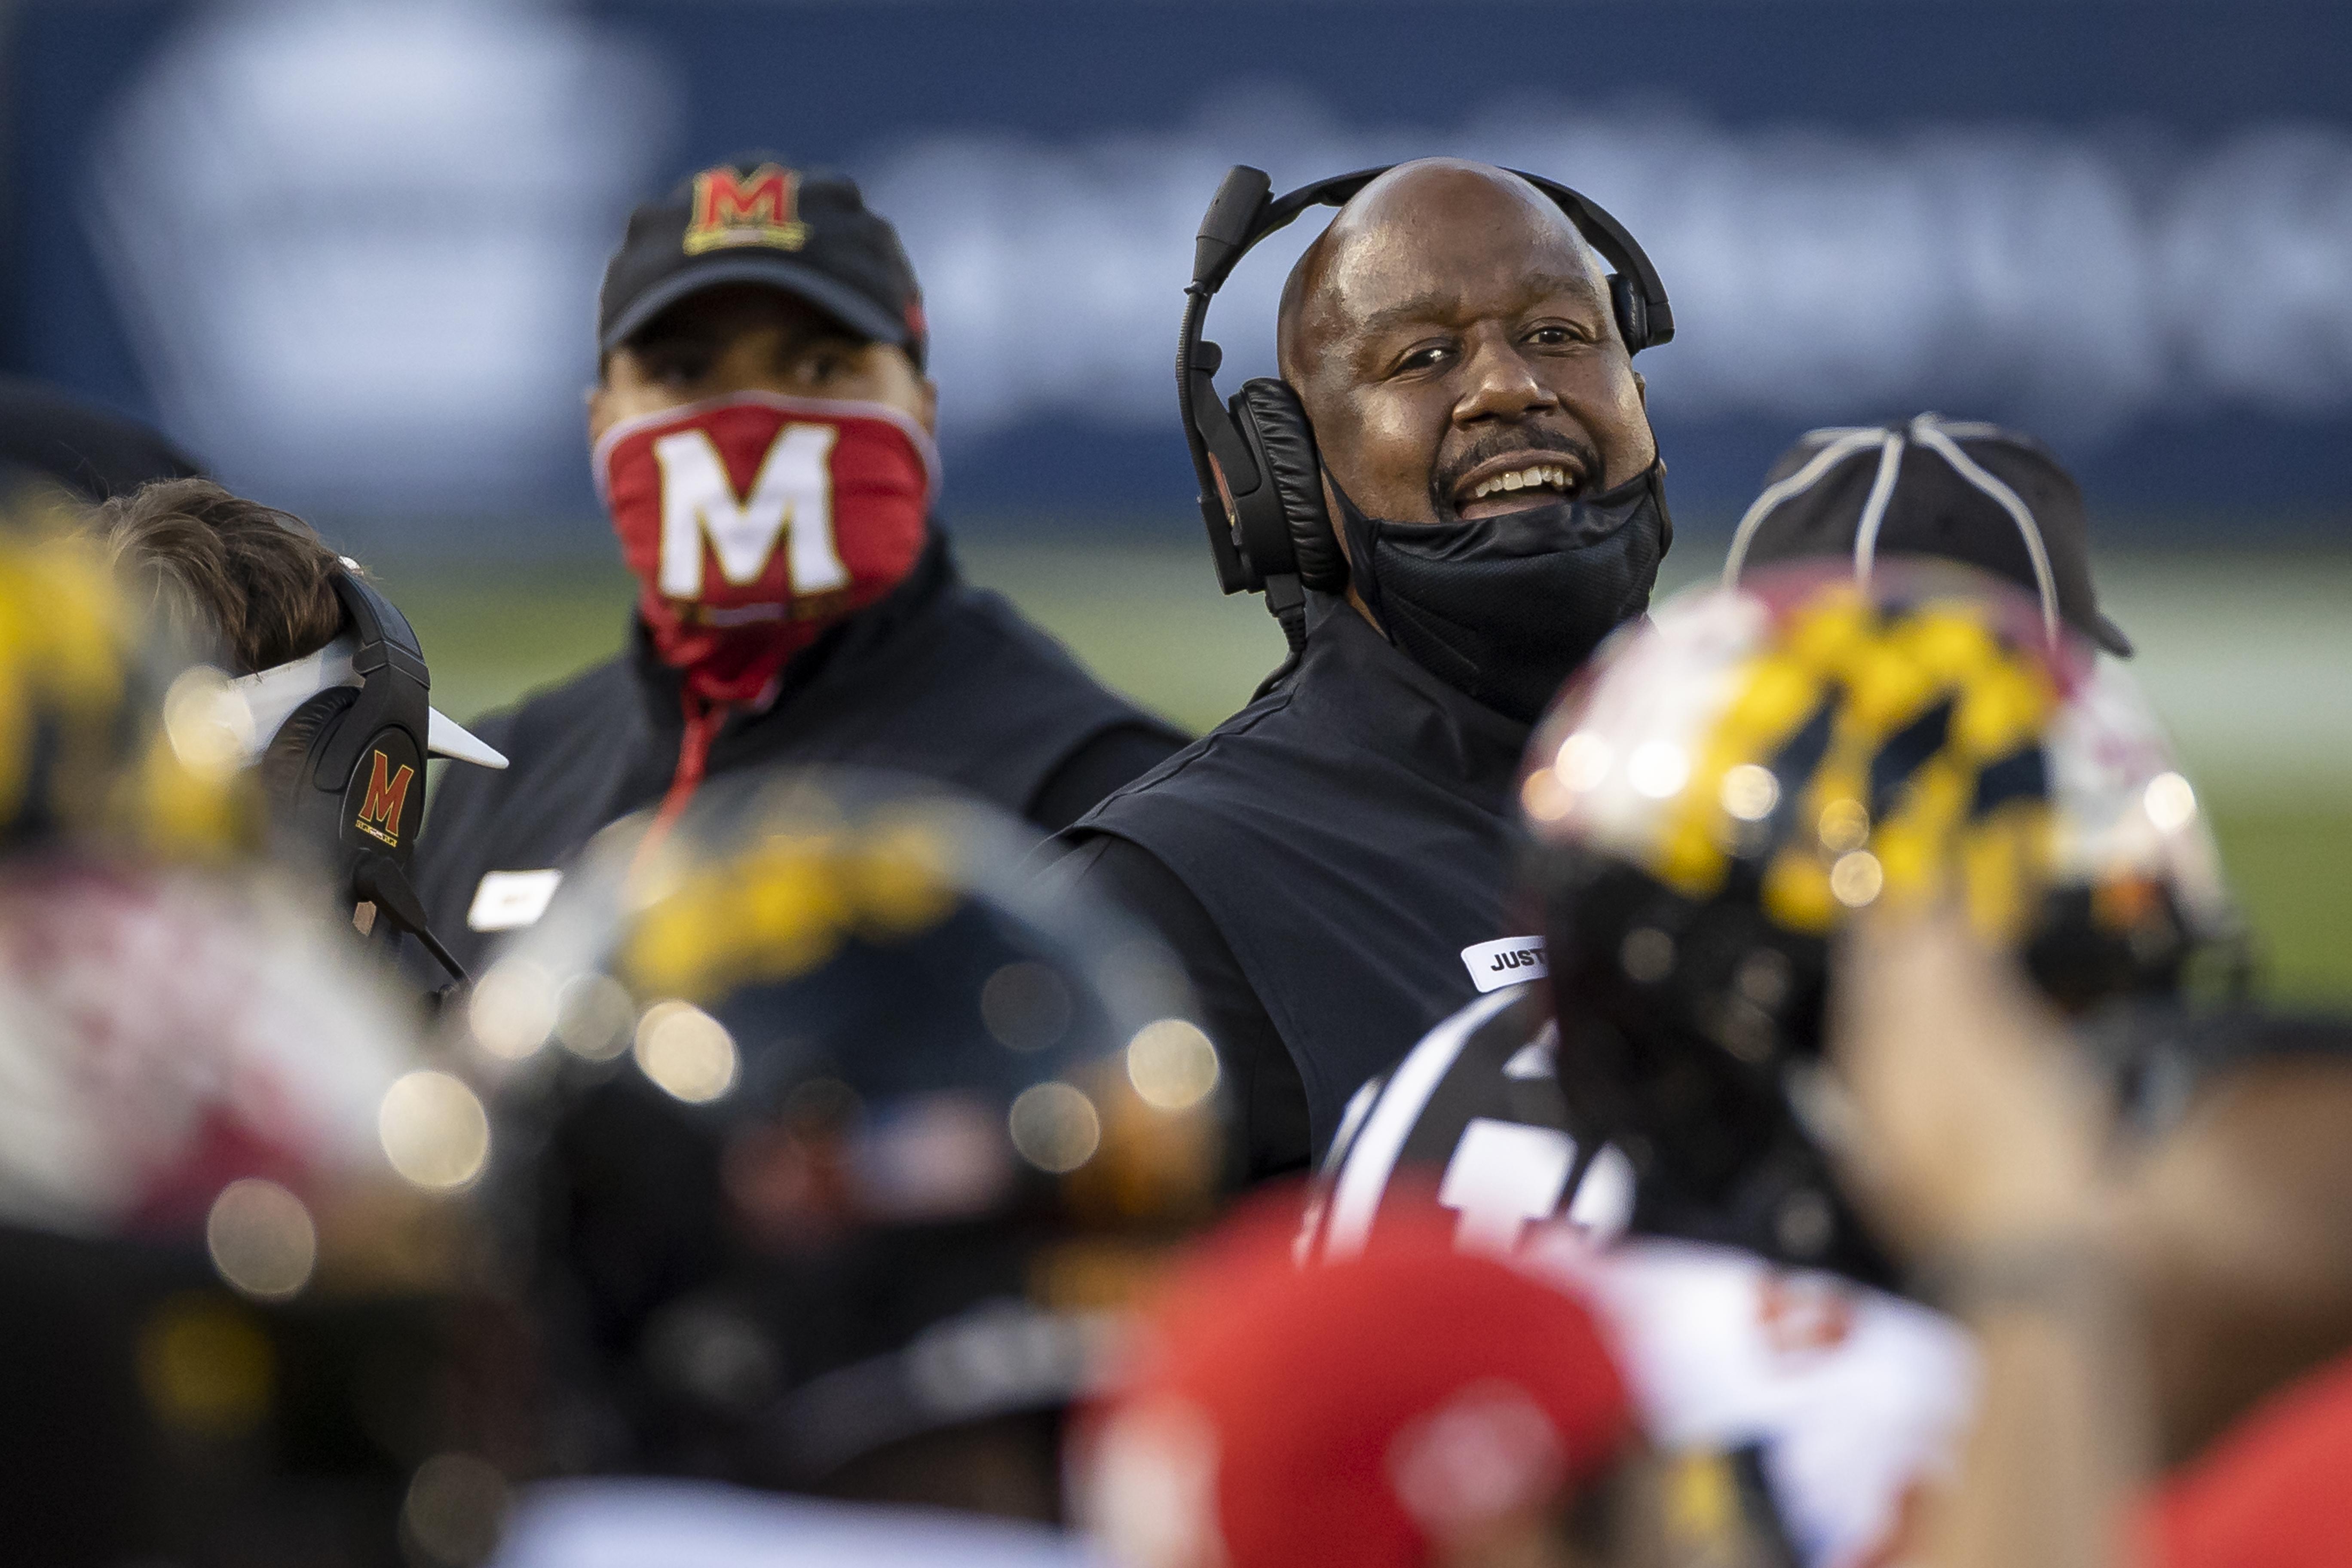 Maryland v Penn State